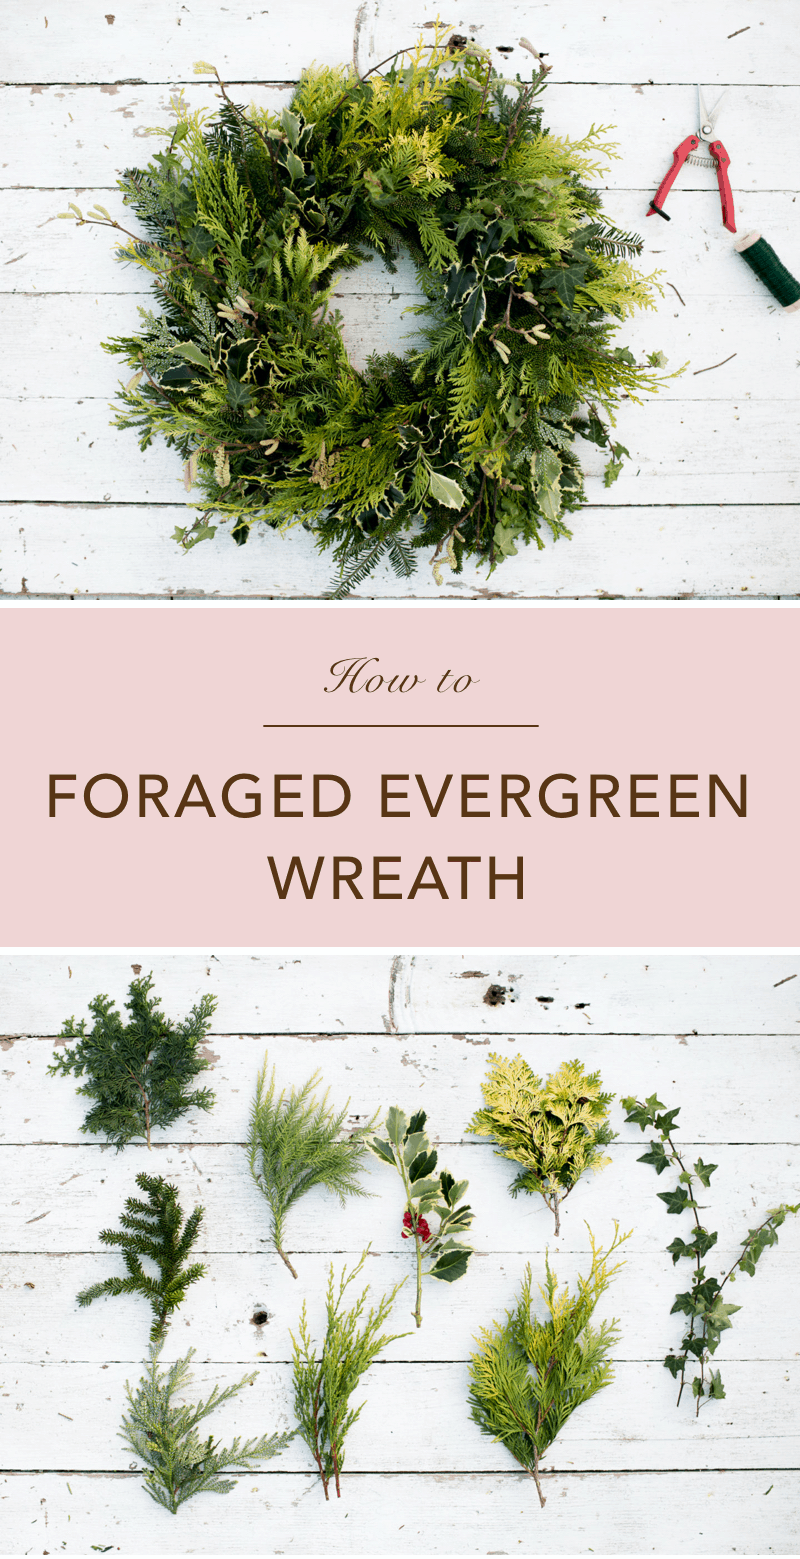 Foraged Evergreen Christmas Wreath DIY